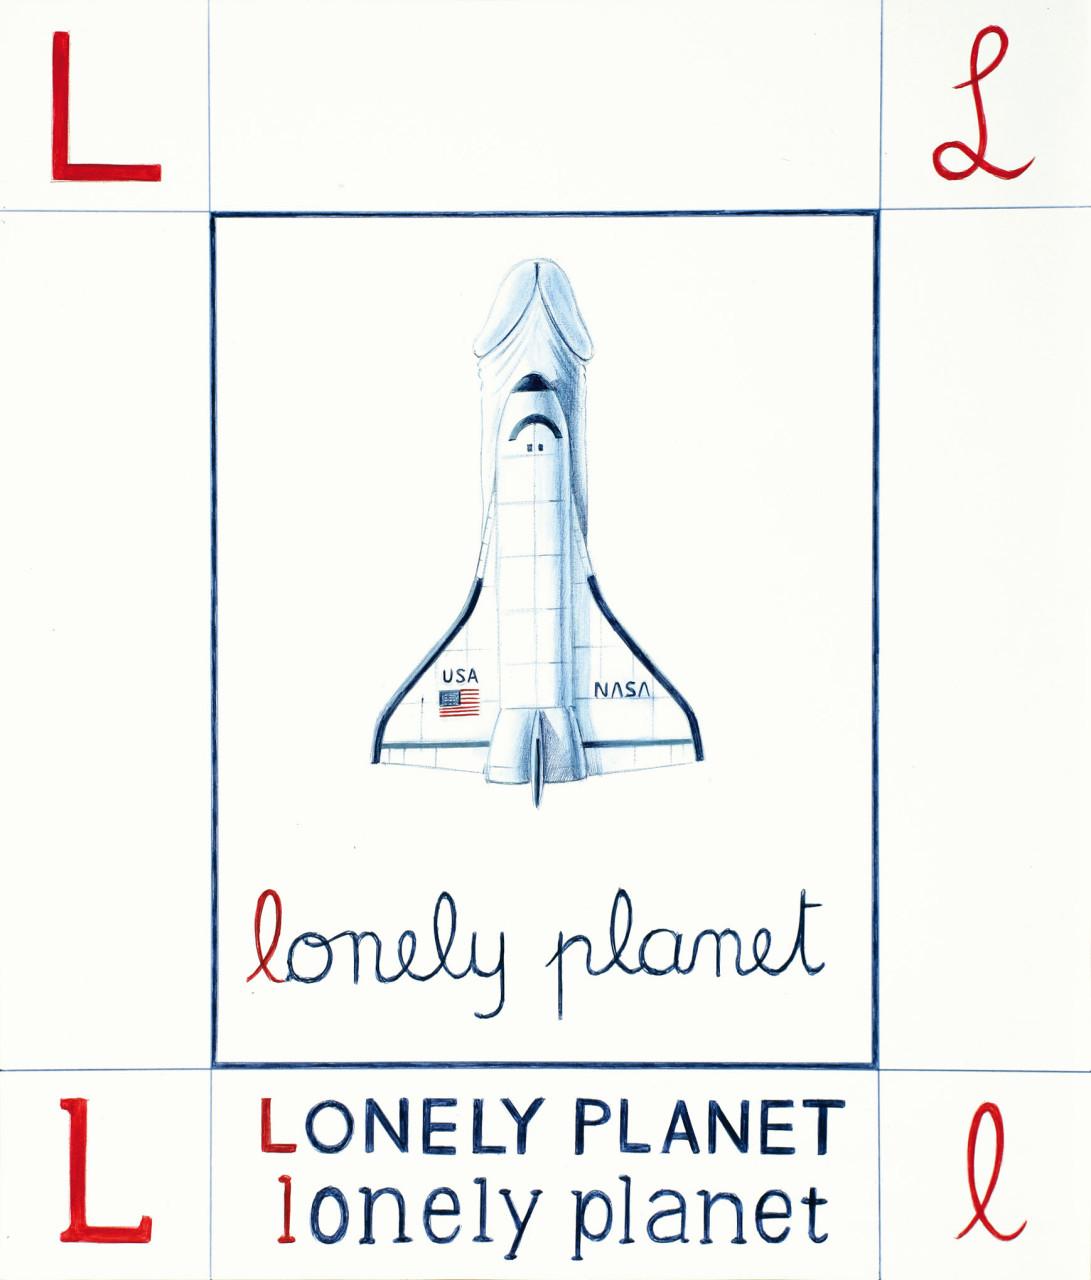 12L-lonely planet_bassa